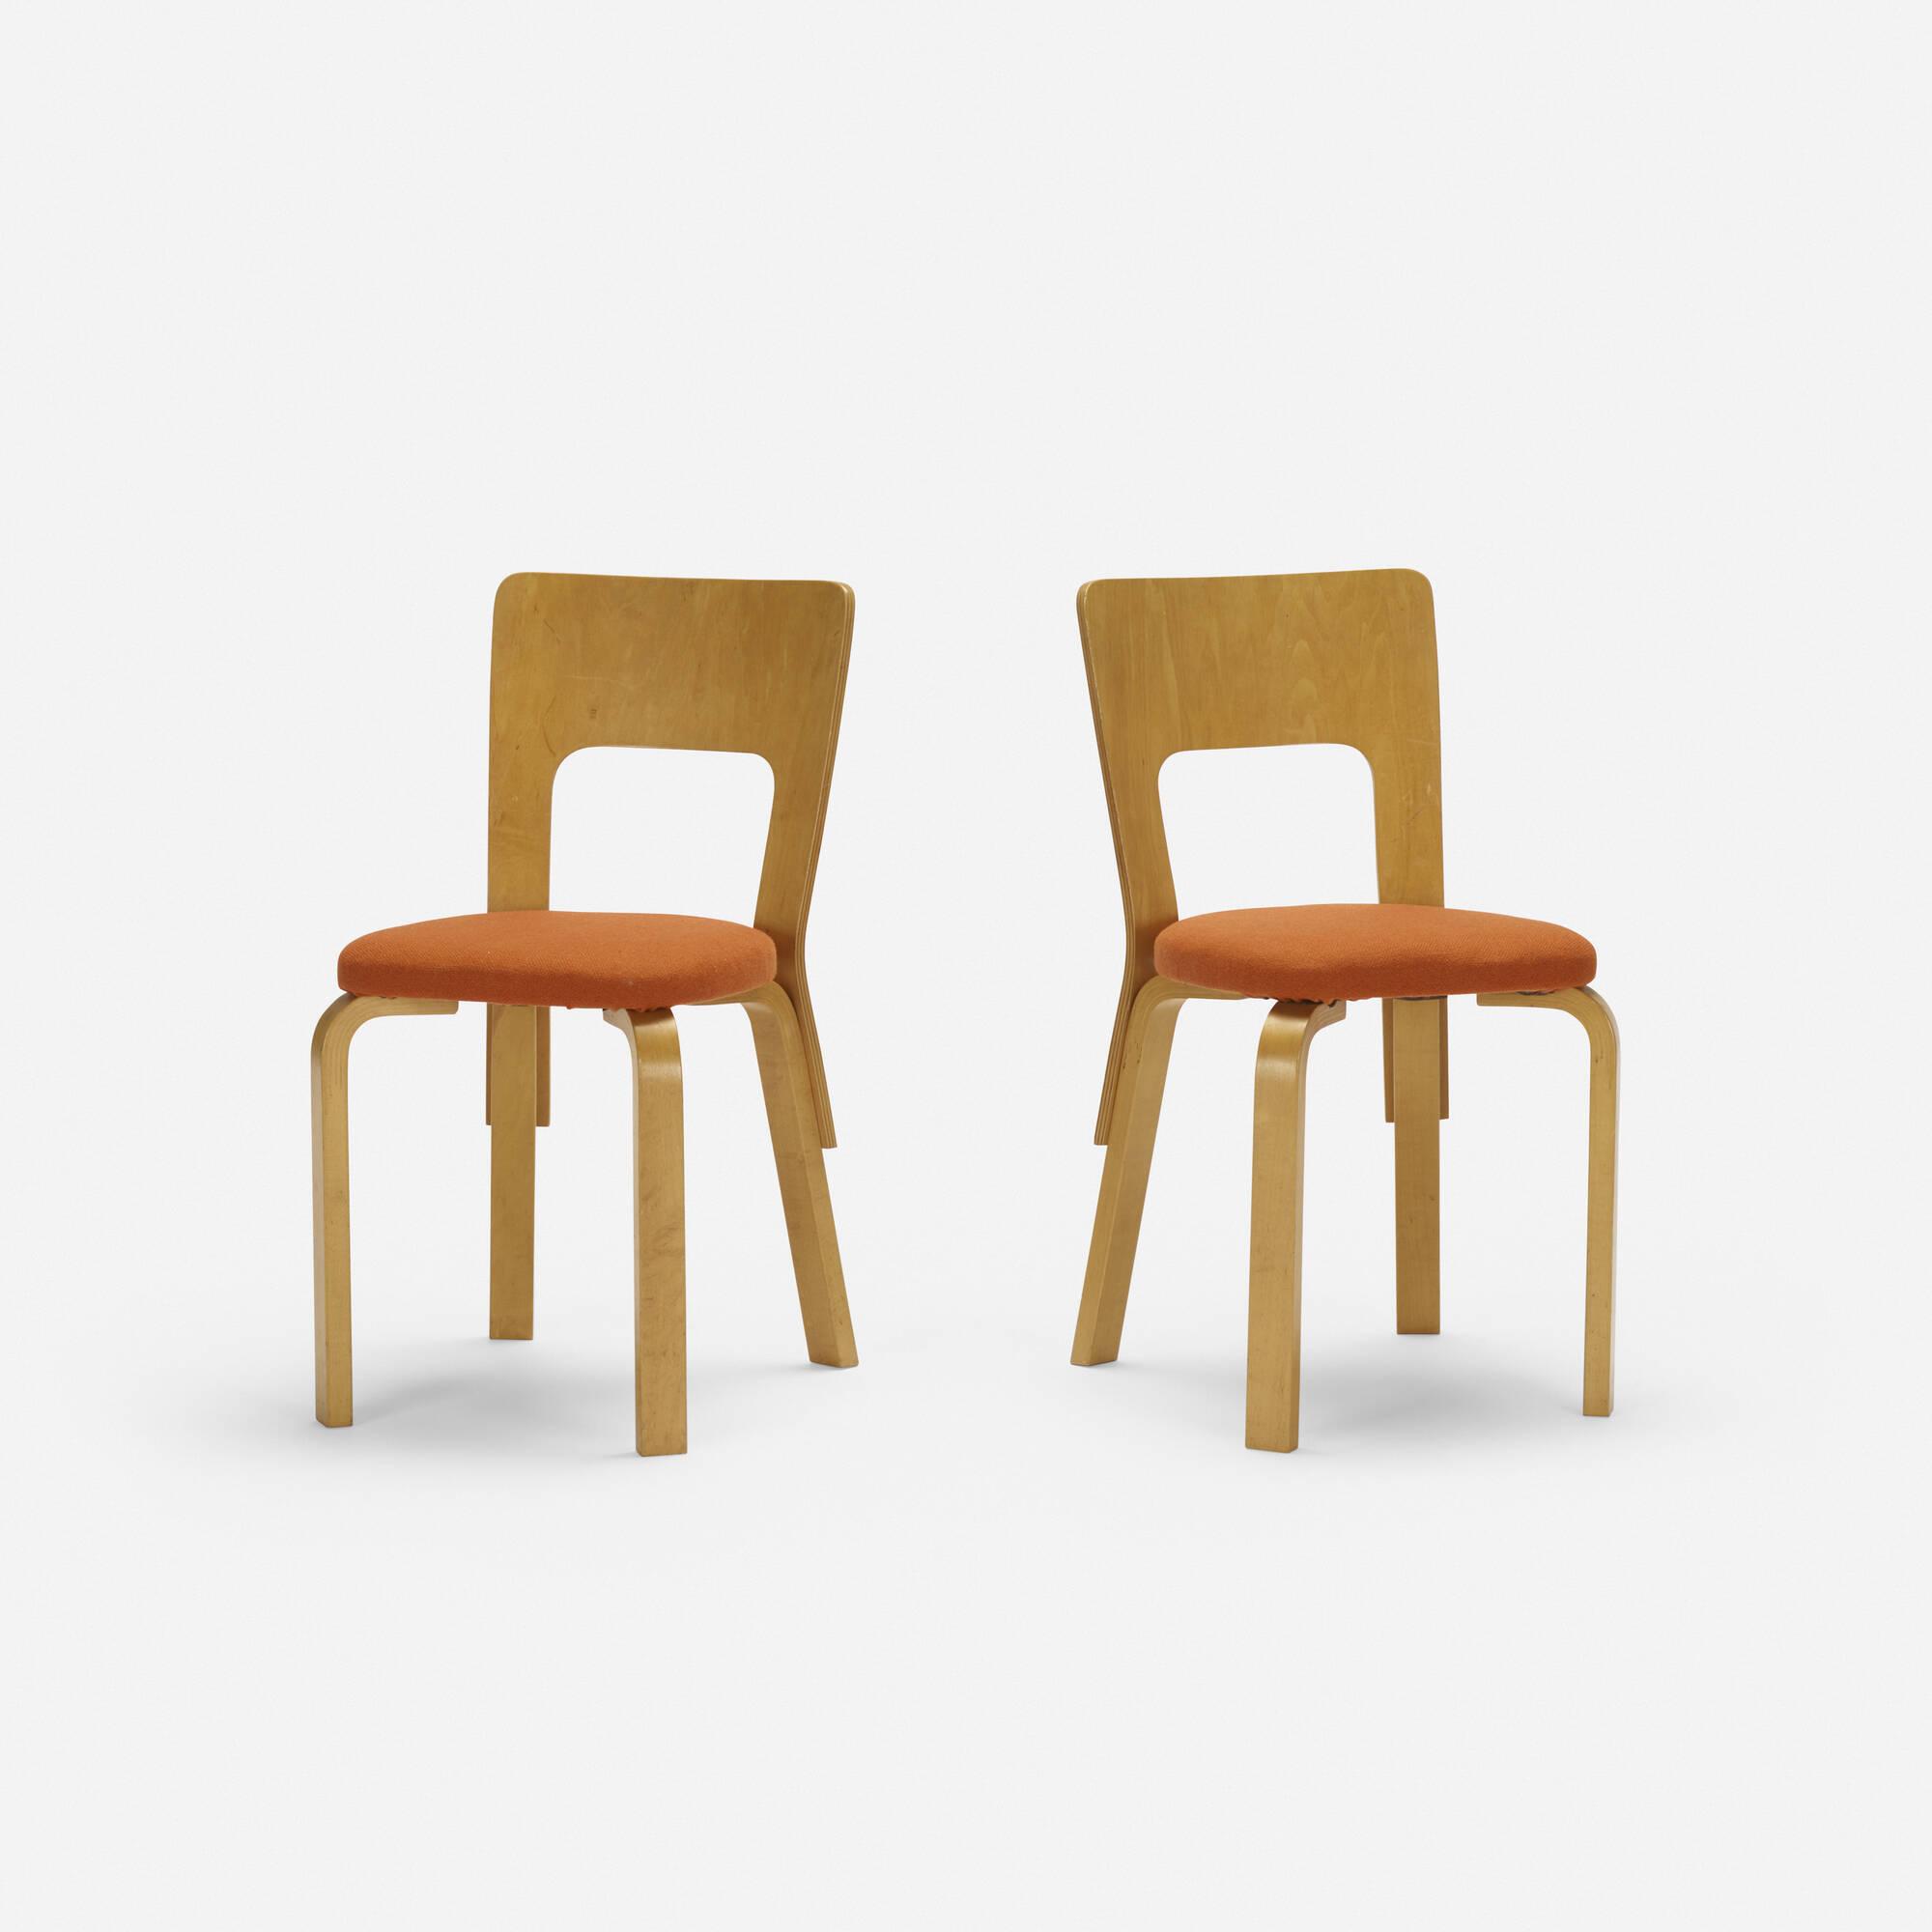 100: Alvar Aalto / Chairs Model 66, Pair (1 Of 3)